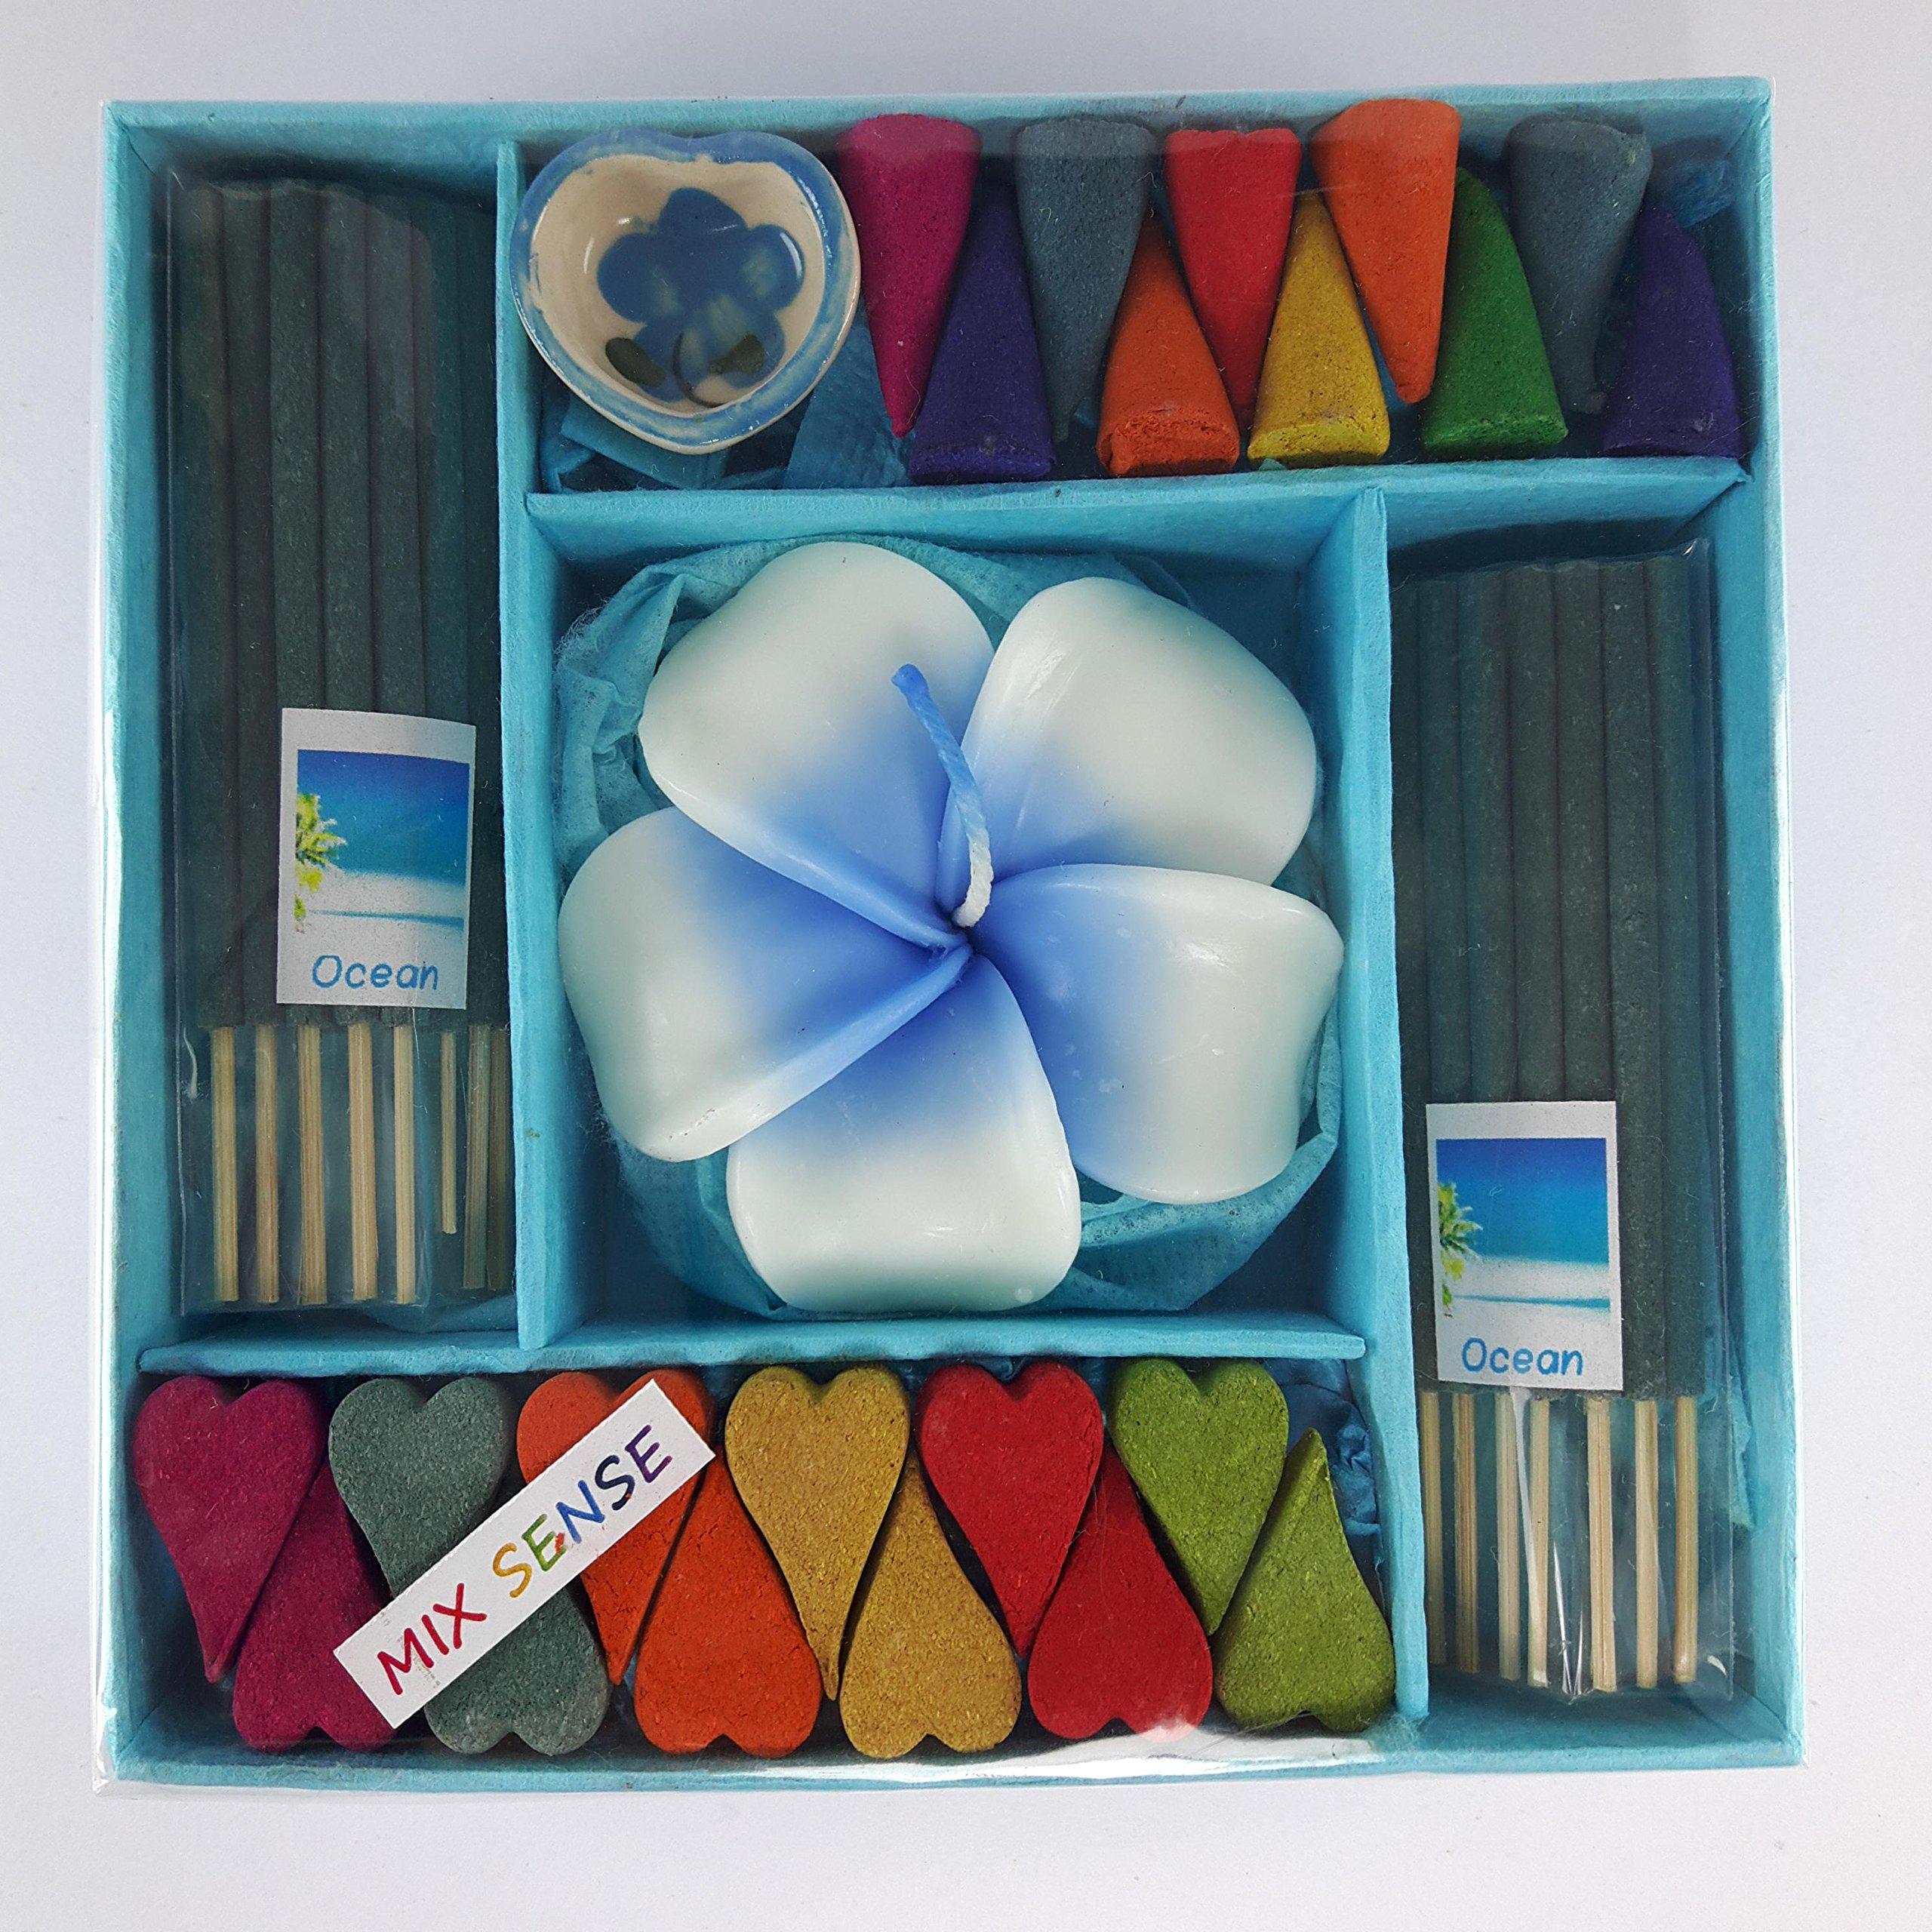 kornkorn87 Incense Spa Aroma Ocean Fragrance Cones Burner Holder Thai Scent Relax Sticks Ceramic Home Gift